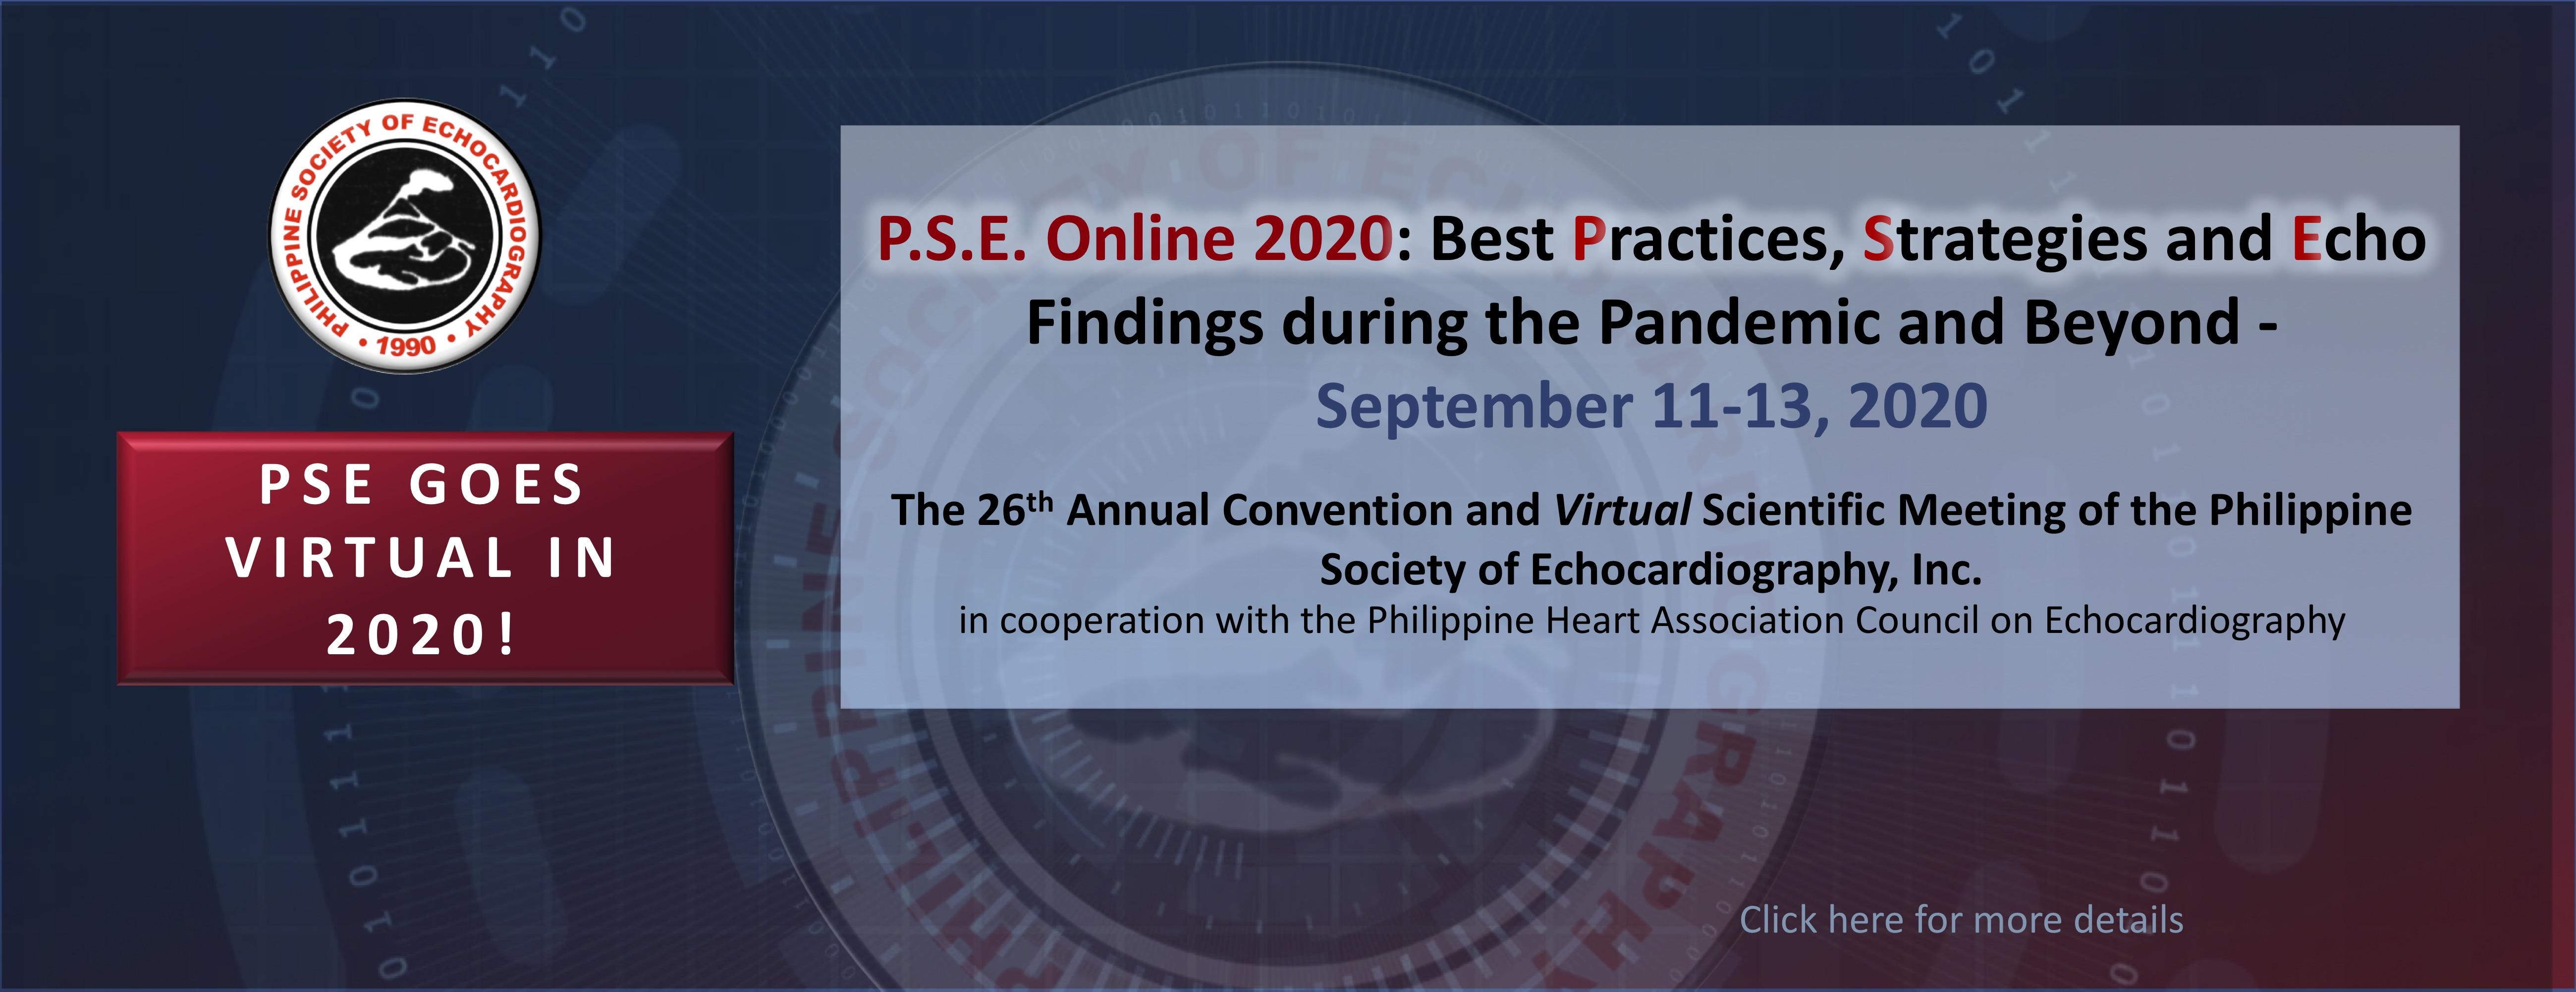 PSE_Online_2020